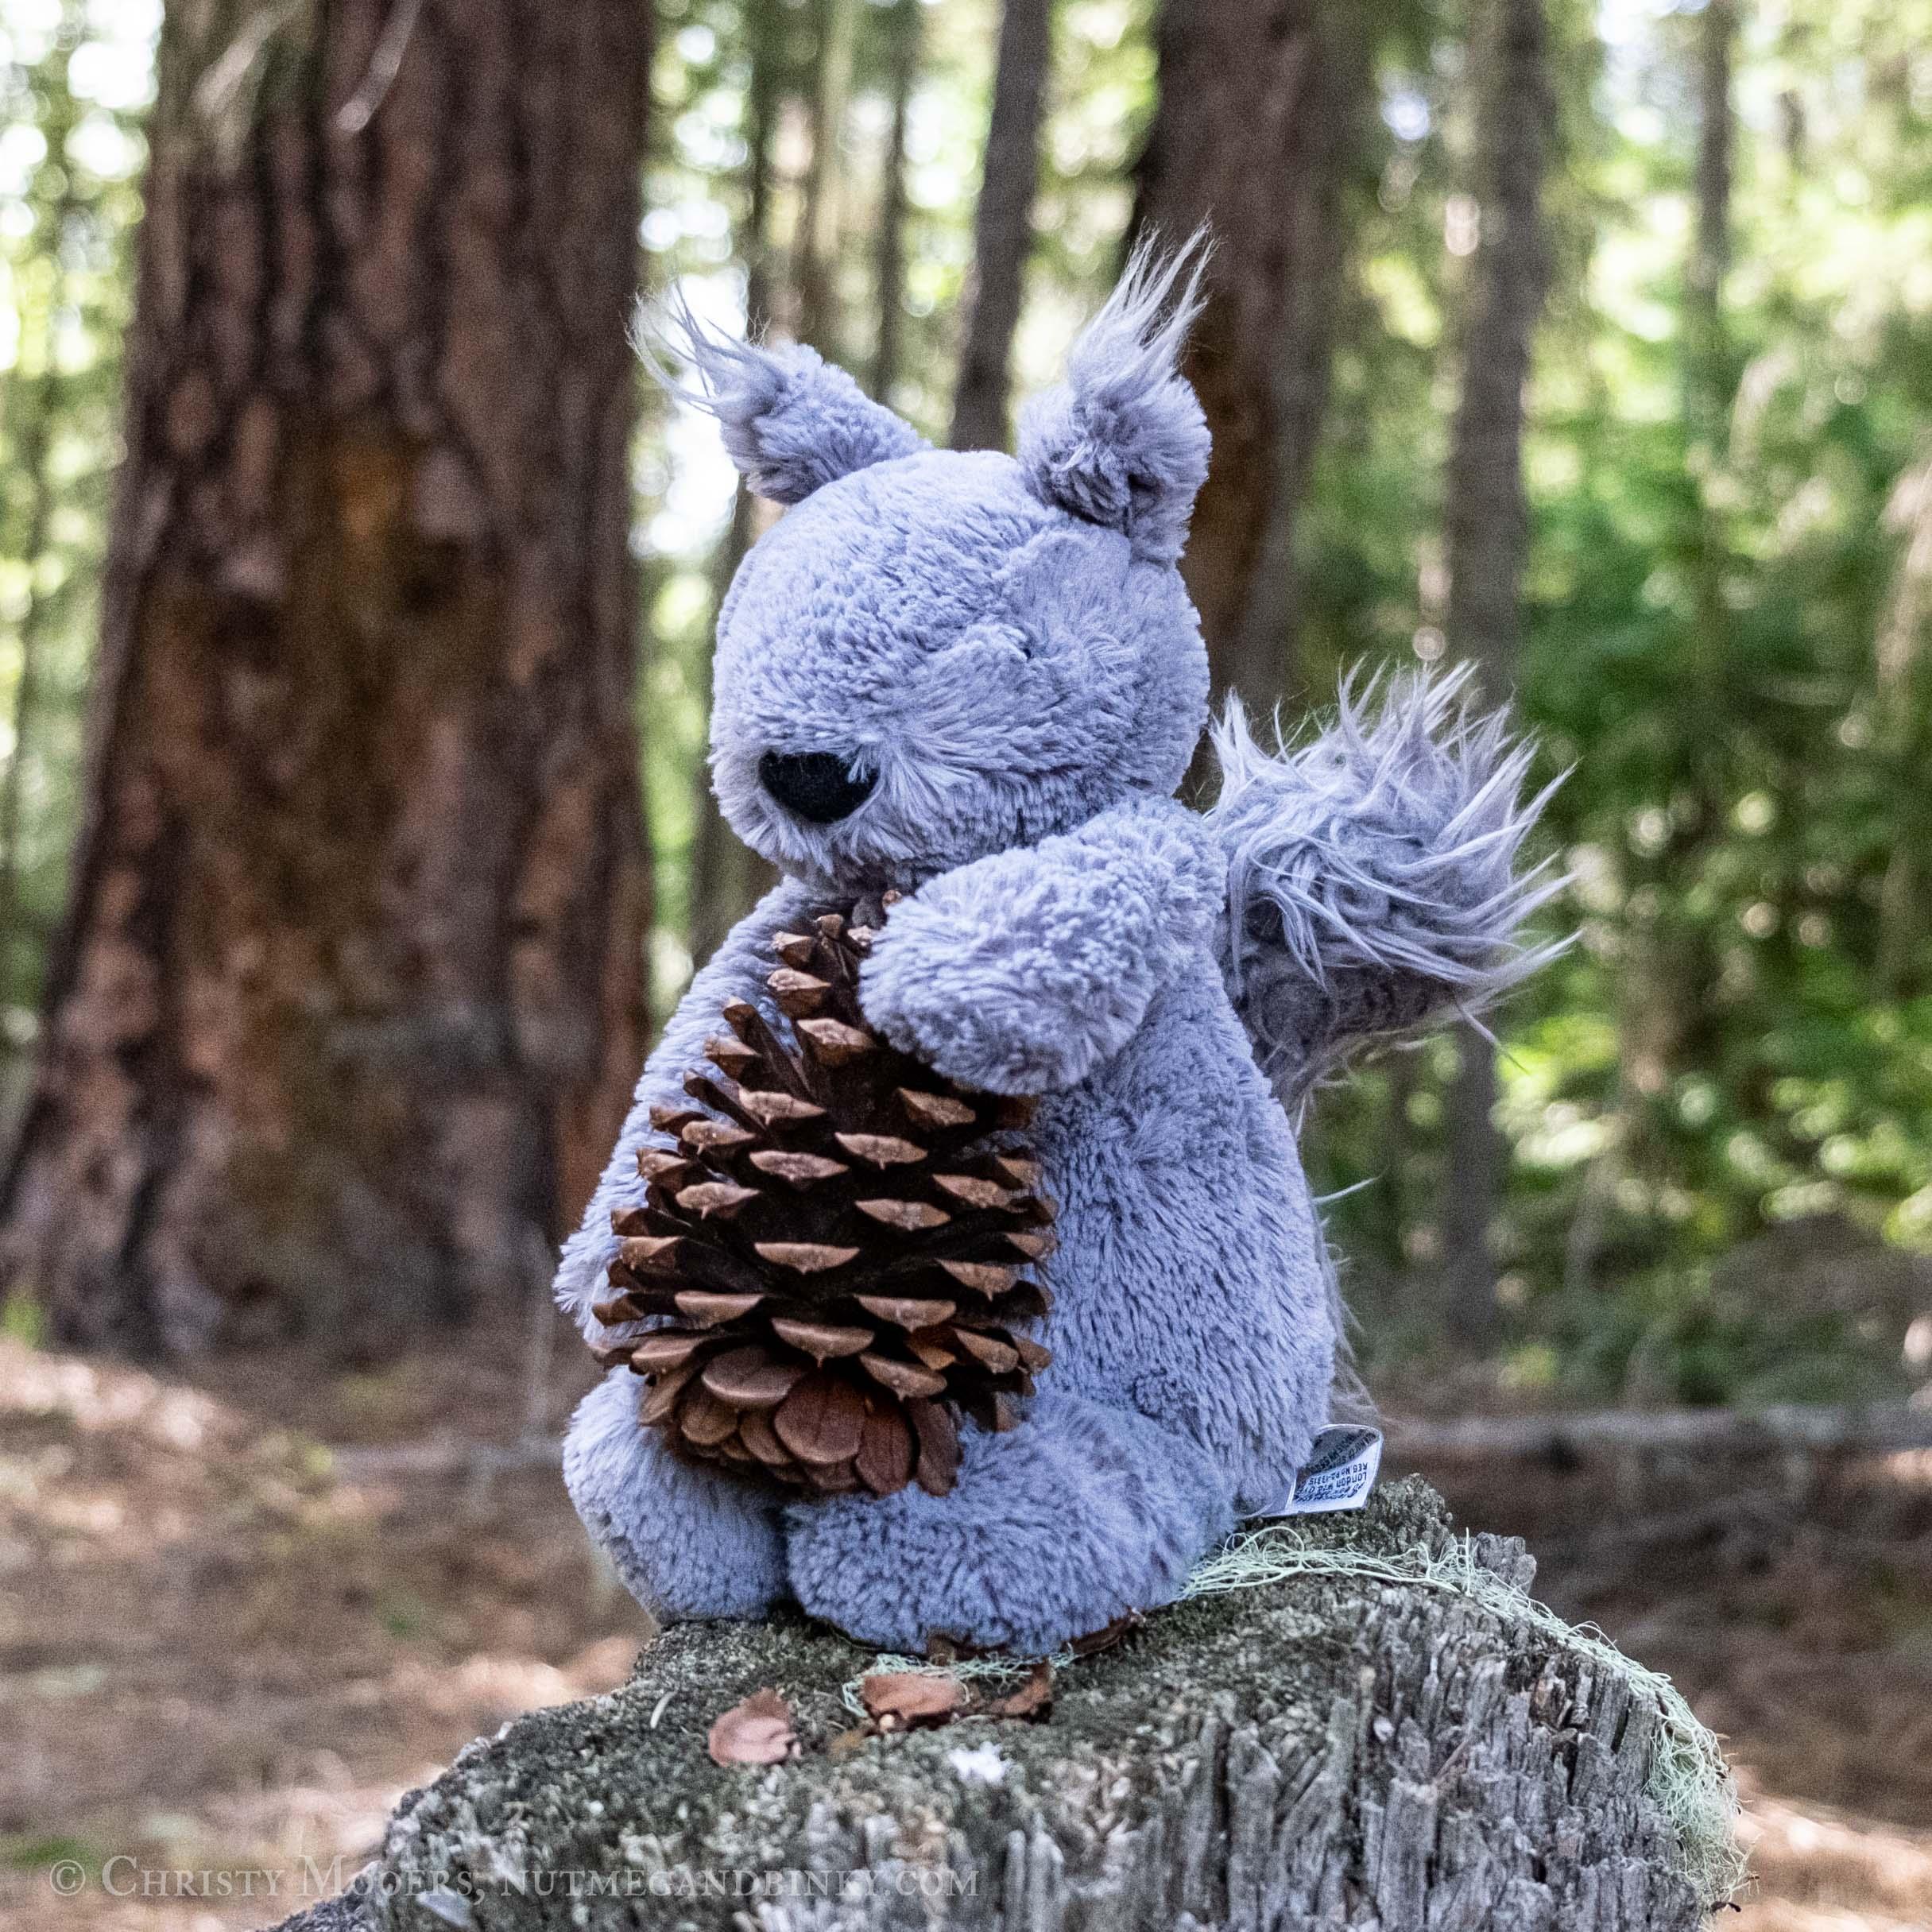 plush squirrel holding a pine cone